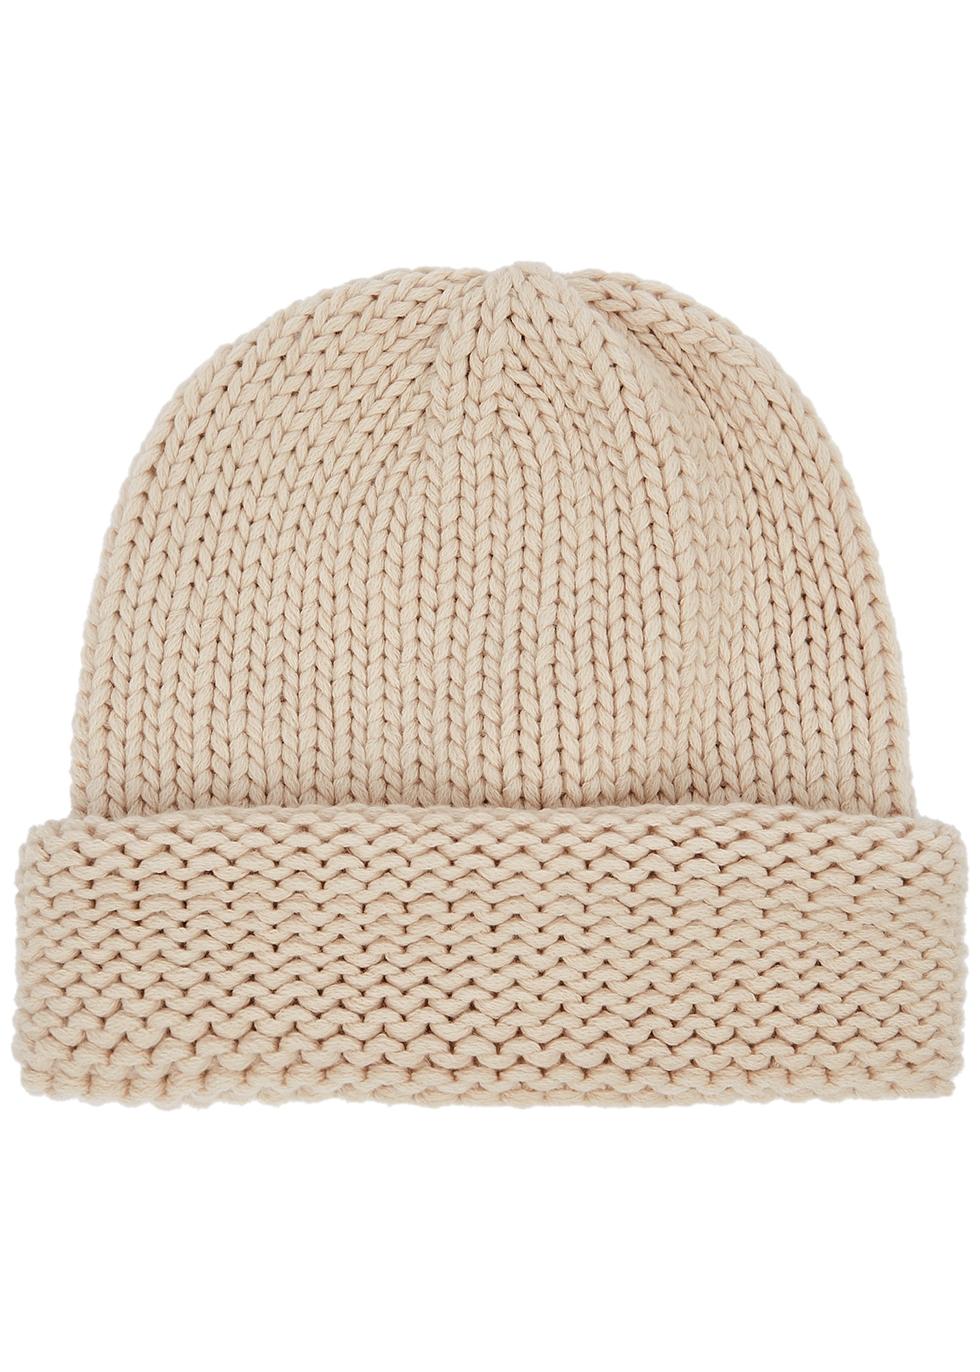 Cream knitted cashmere beanie